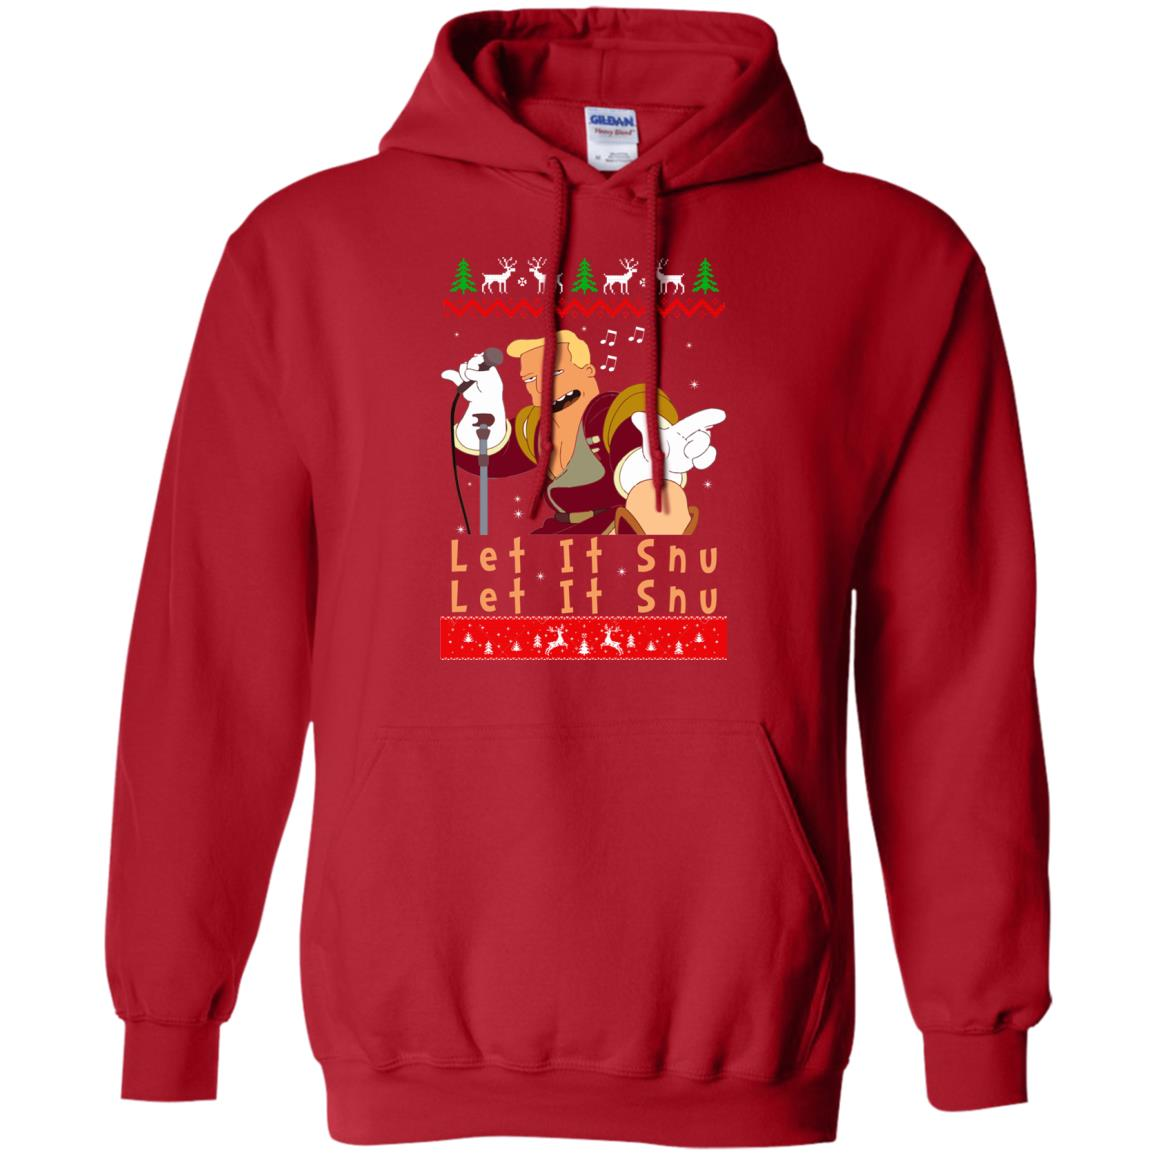 image 717 - Zapp Brannigan Let It Snu Christmas Sweatshirt, Hoodie